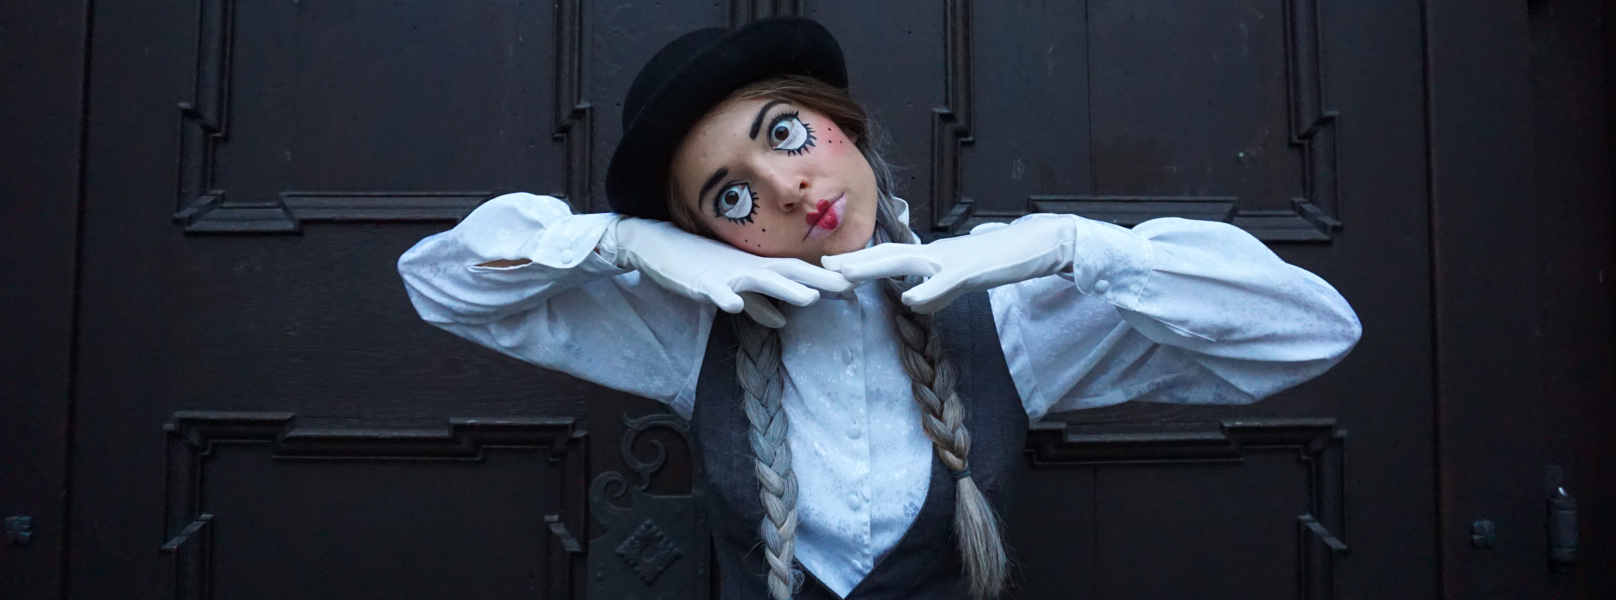 Pantomimin Puppe